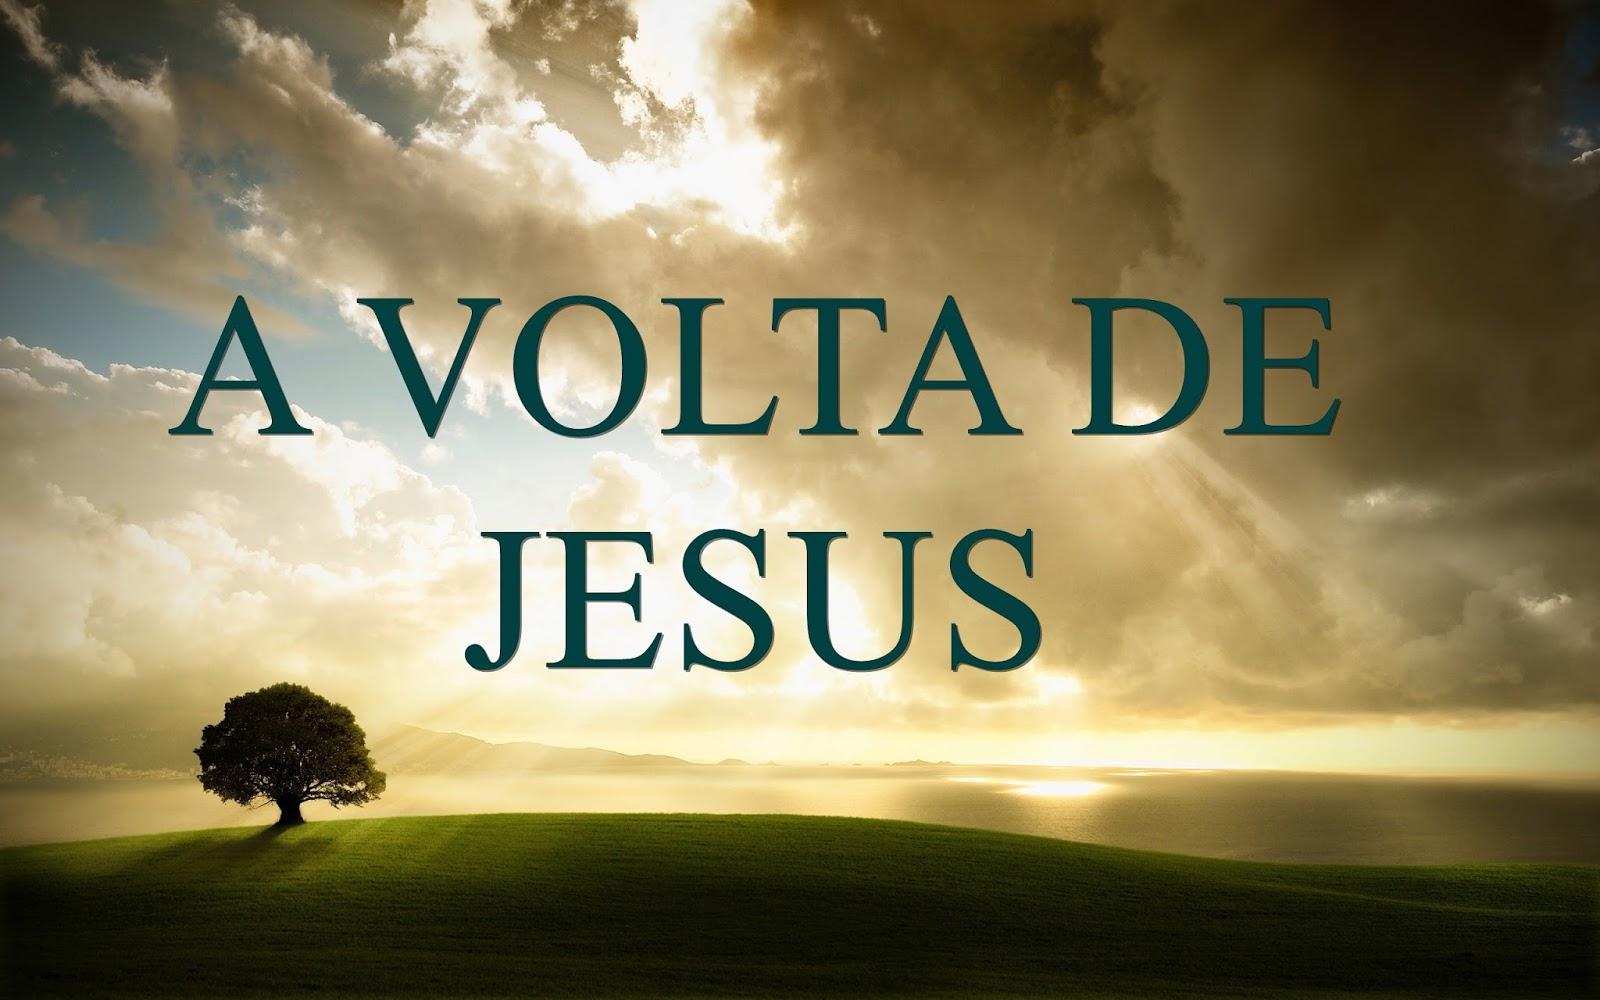 04 Motivos Porque Os Pastores Pararam De Pregar Sobre A Volta De